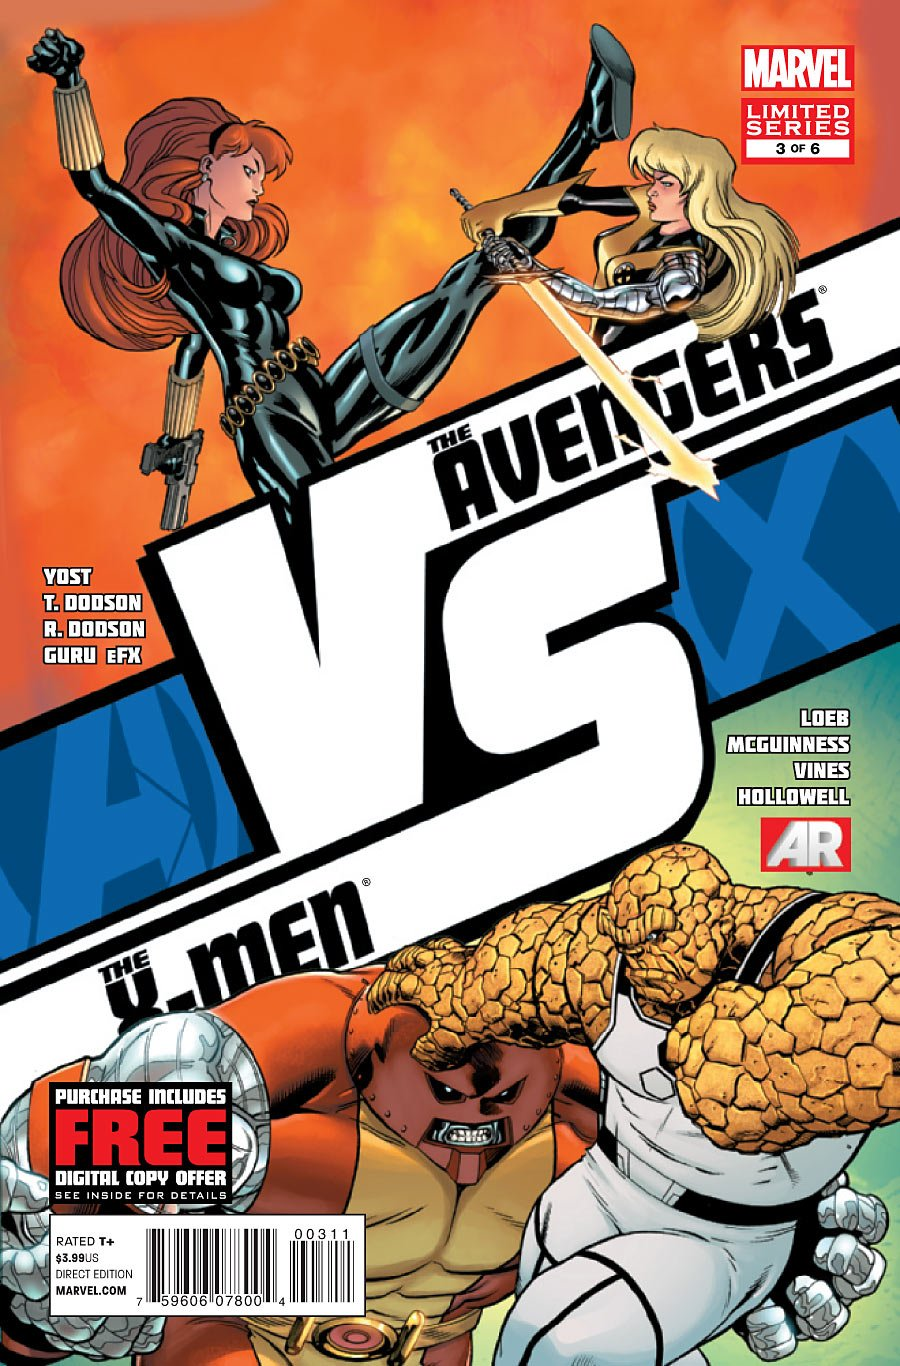 "The avengers VS The X-Men #3 (""Black Widow vs. Magik & Colossus vs. Thing"") PDF"